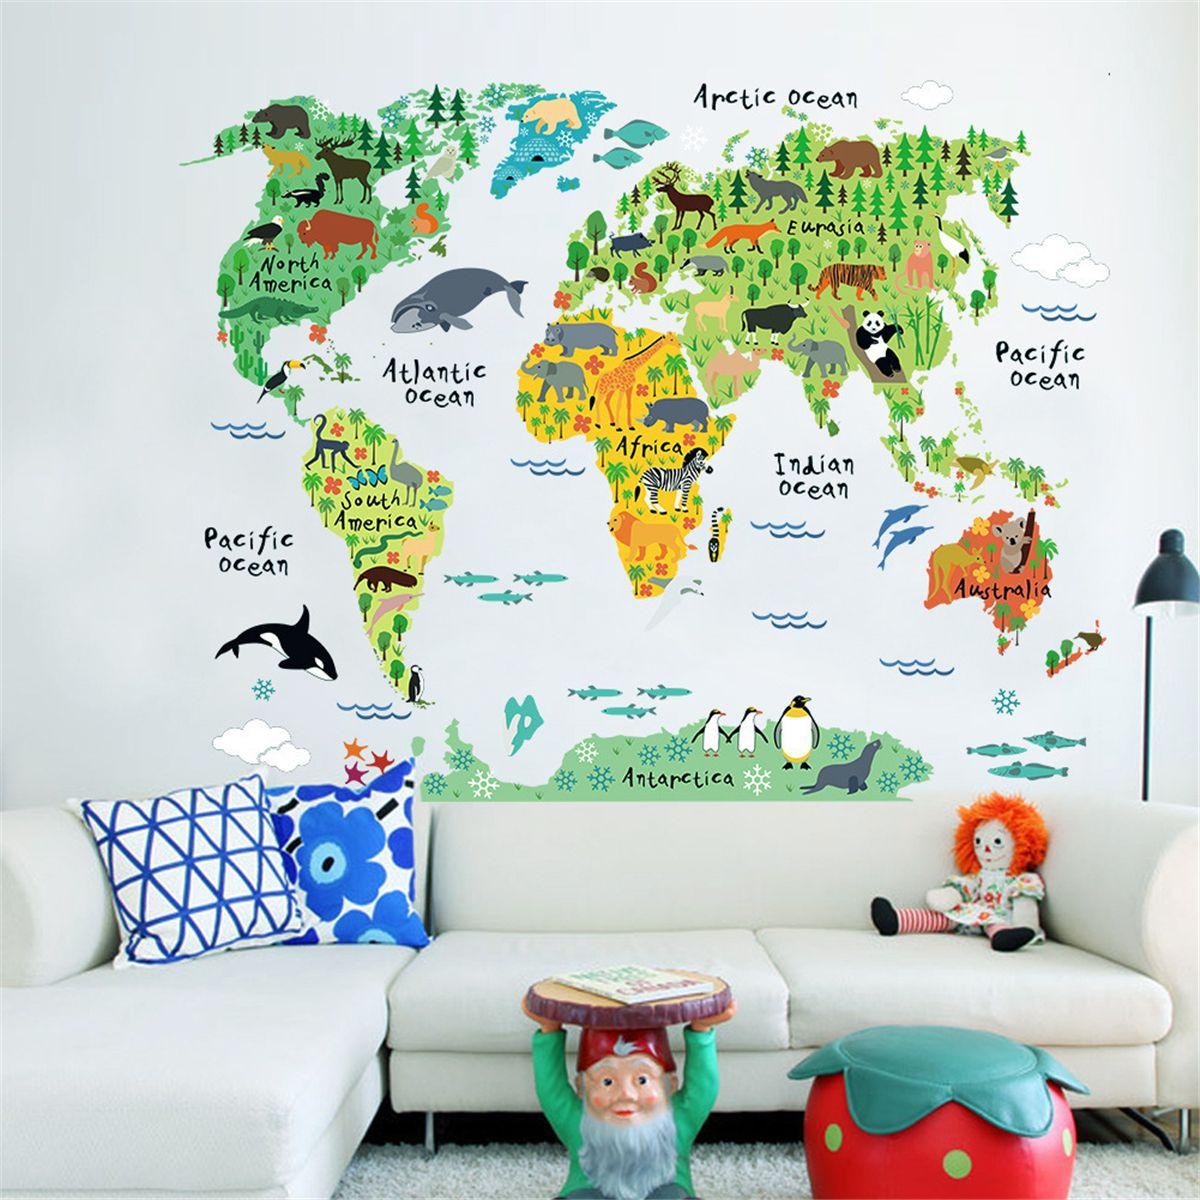 Kreative Neue Cartoon Tiere Weltkarte Wandtattoos Für Kinderzimmer Office  Home Decorations PVC Wandaufkleber Diy Wandbild Kunst Poster Grüne Karte